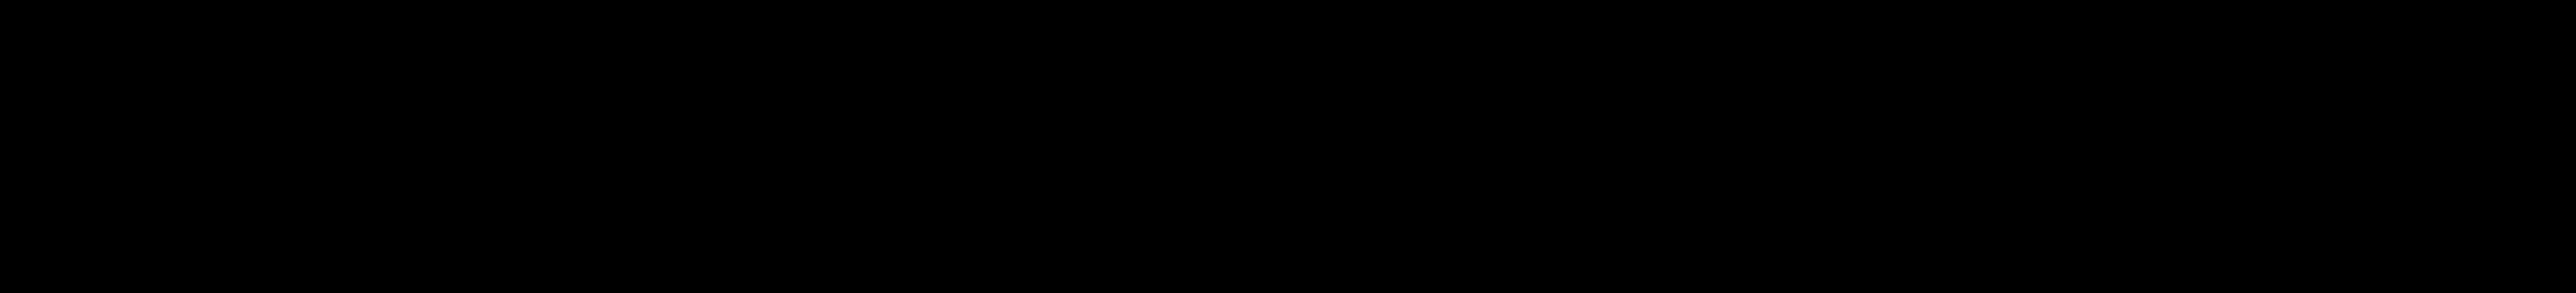 Volta Kvartal